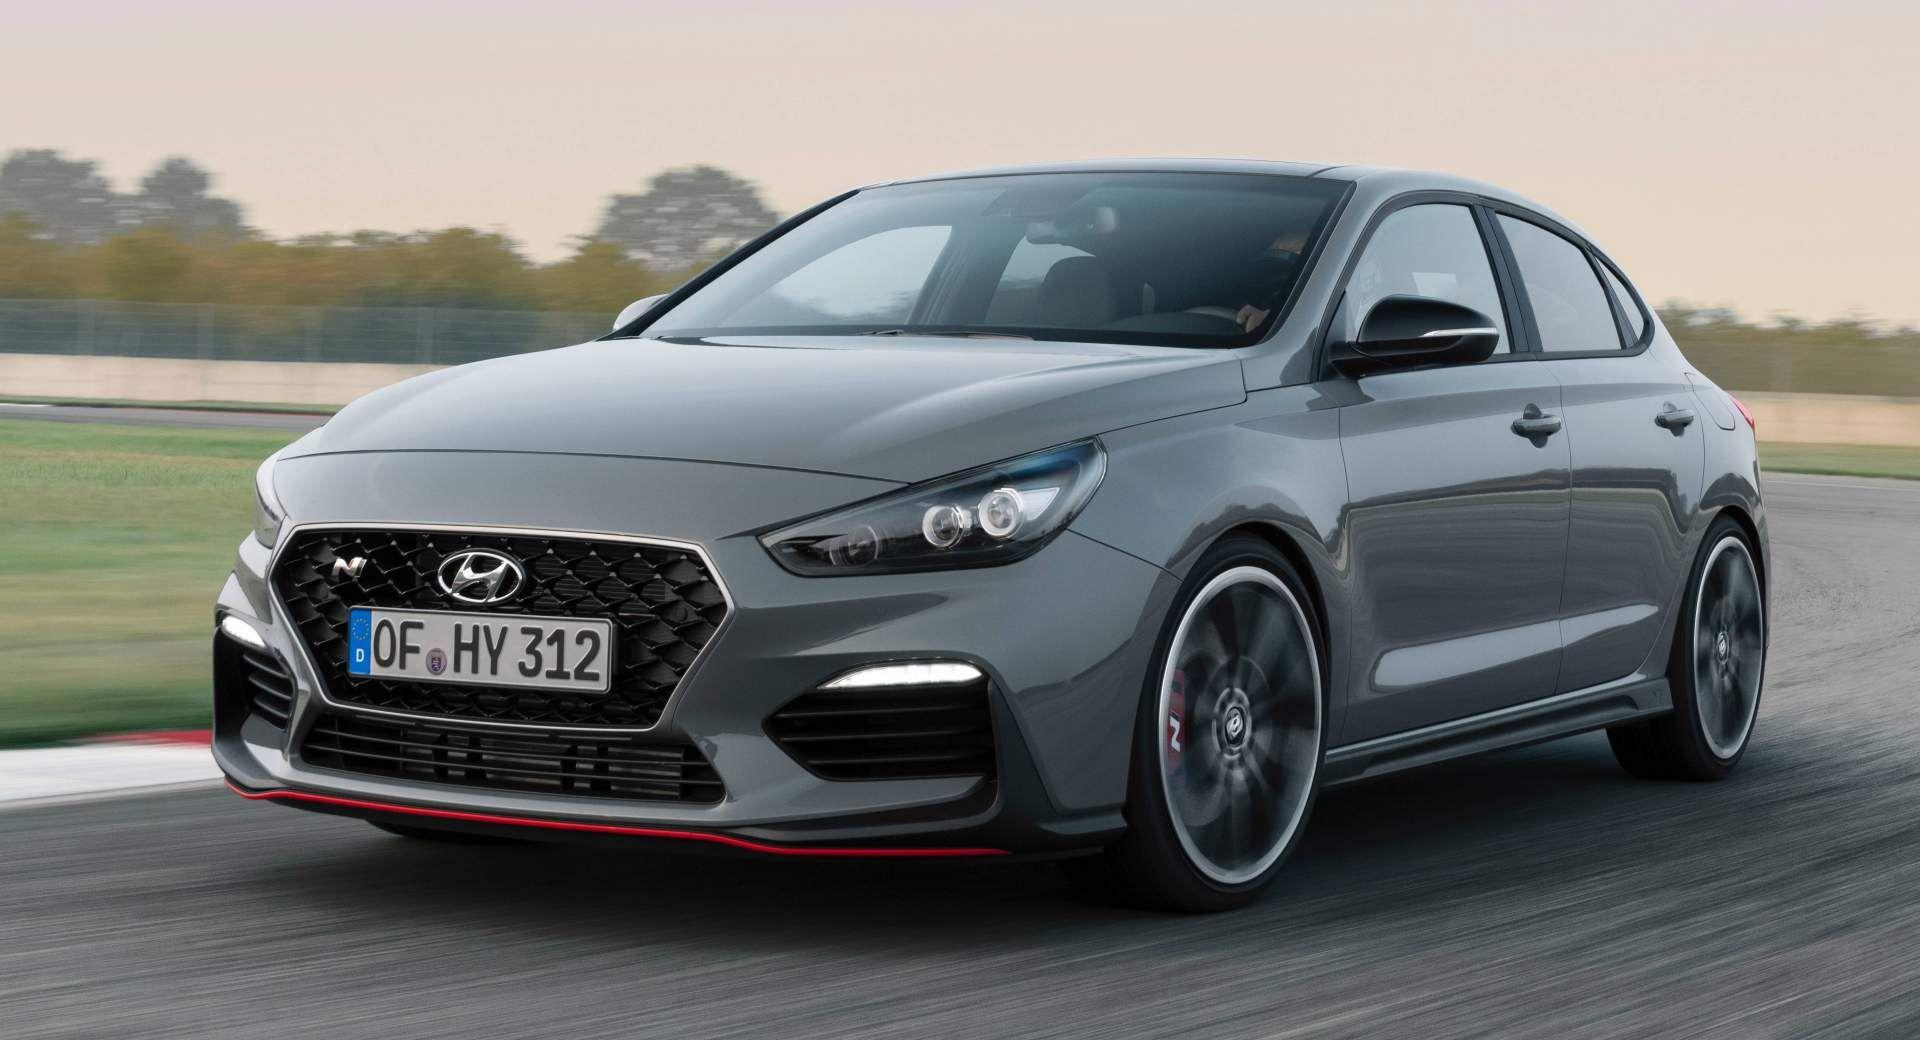 2019 Hyundai I30 Fastback N Breaks Cover In Denmark Ahead Of Paris Debut Carscoops Hyundai Hyundai Cars Hatchback